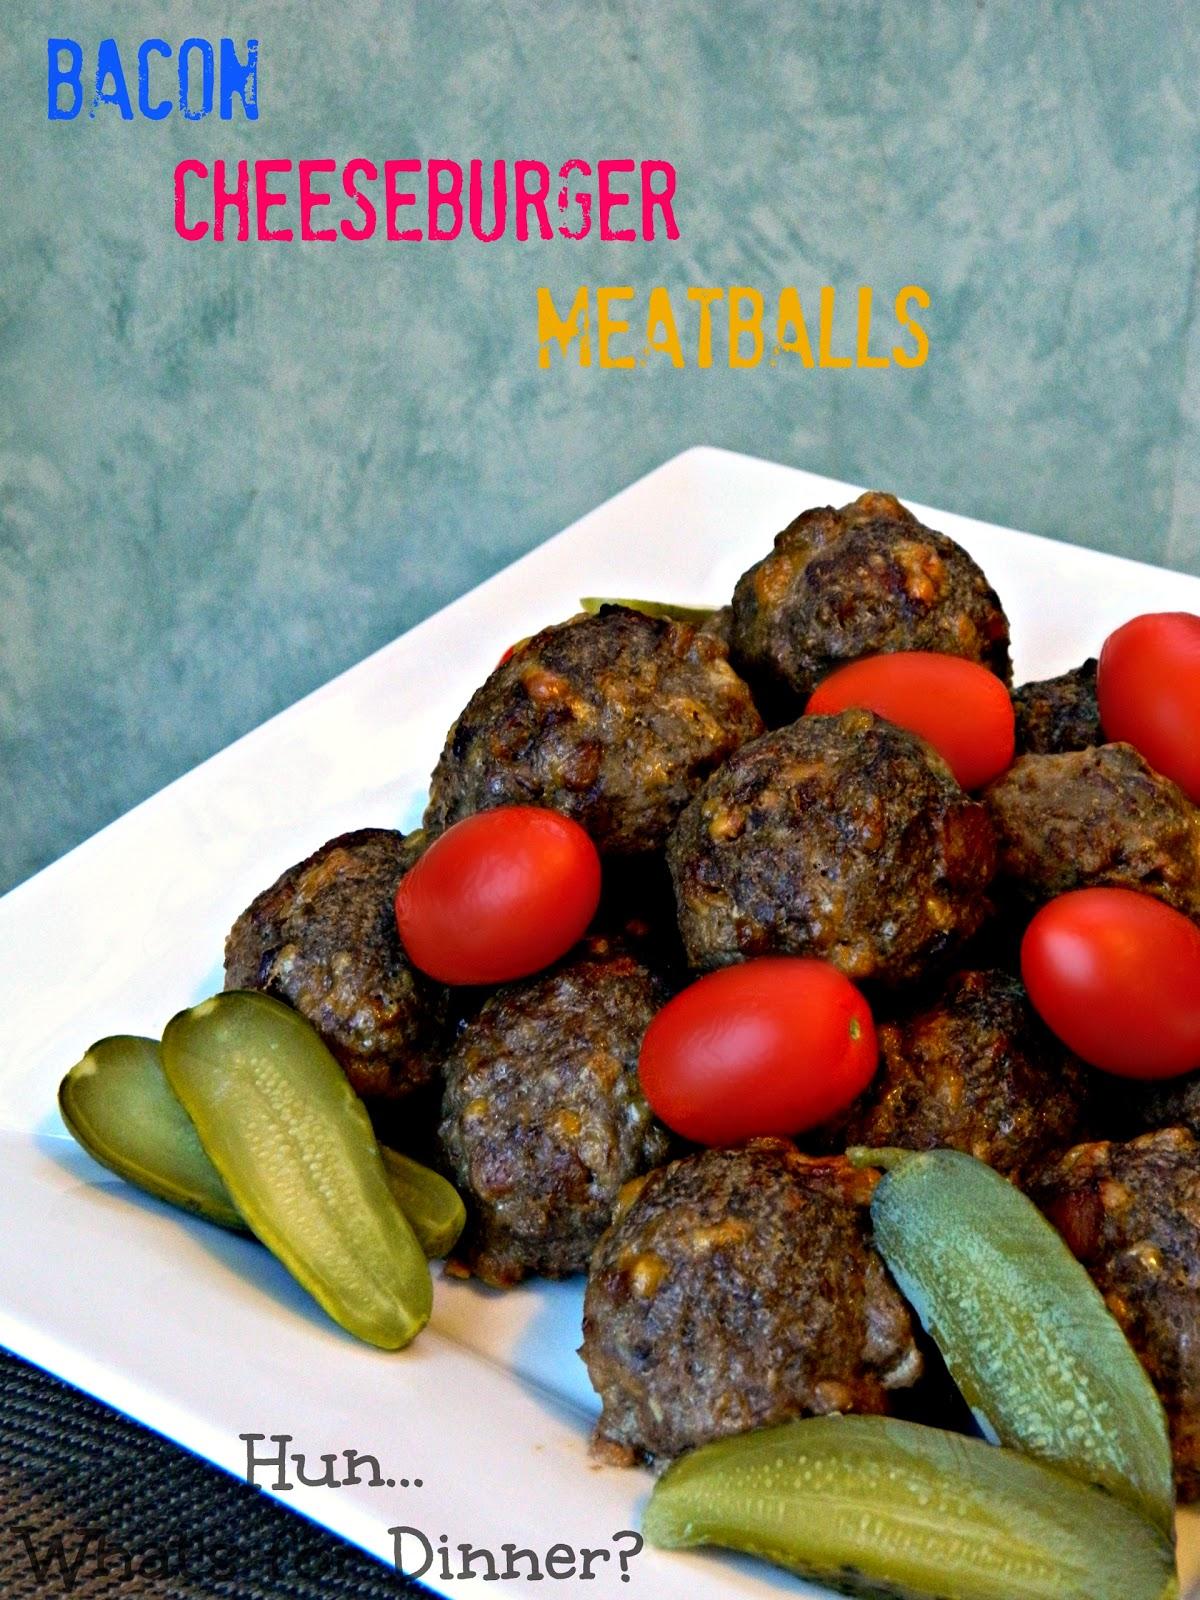 Secret Recipe Club- Bacon Cheeseburger Meatballs on Hun... What's for Dinner?